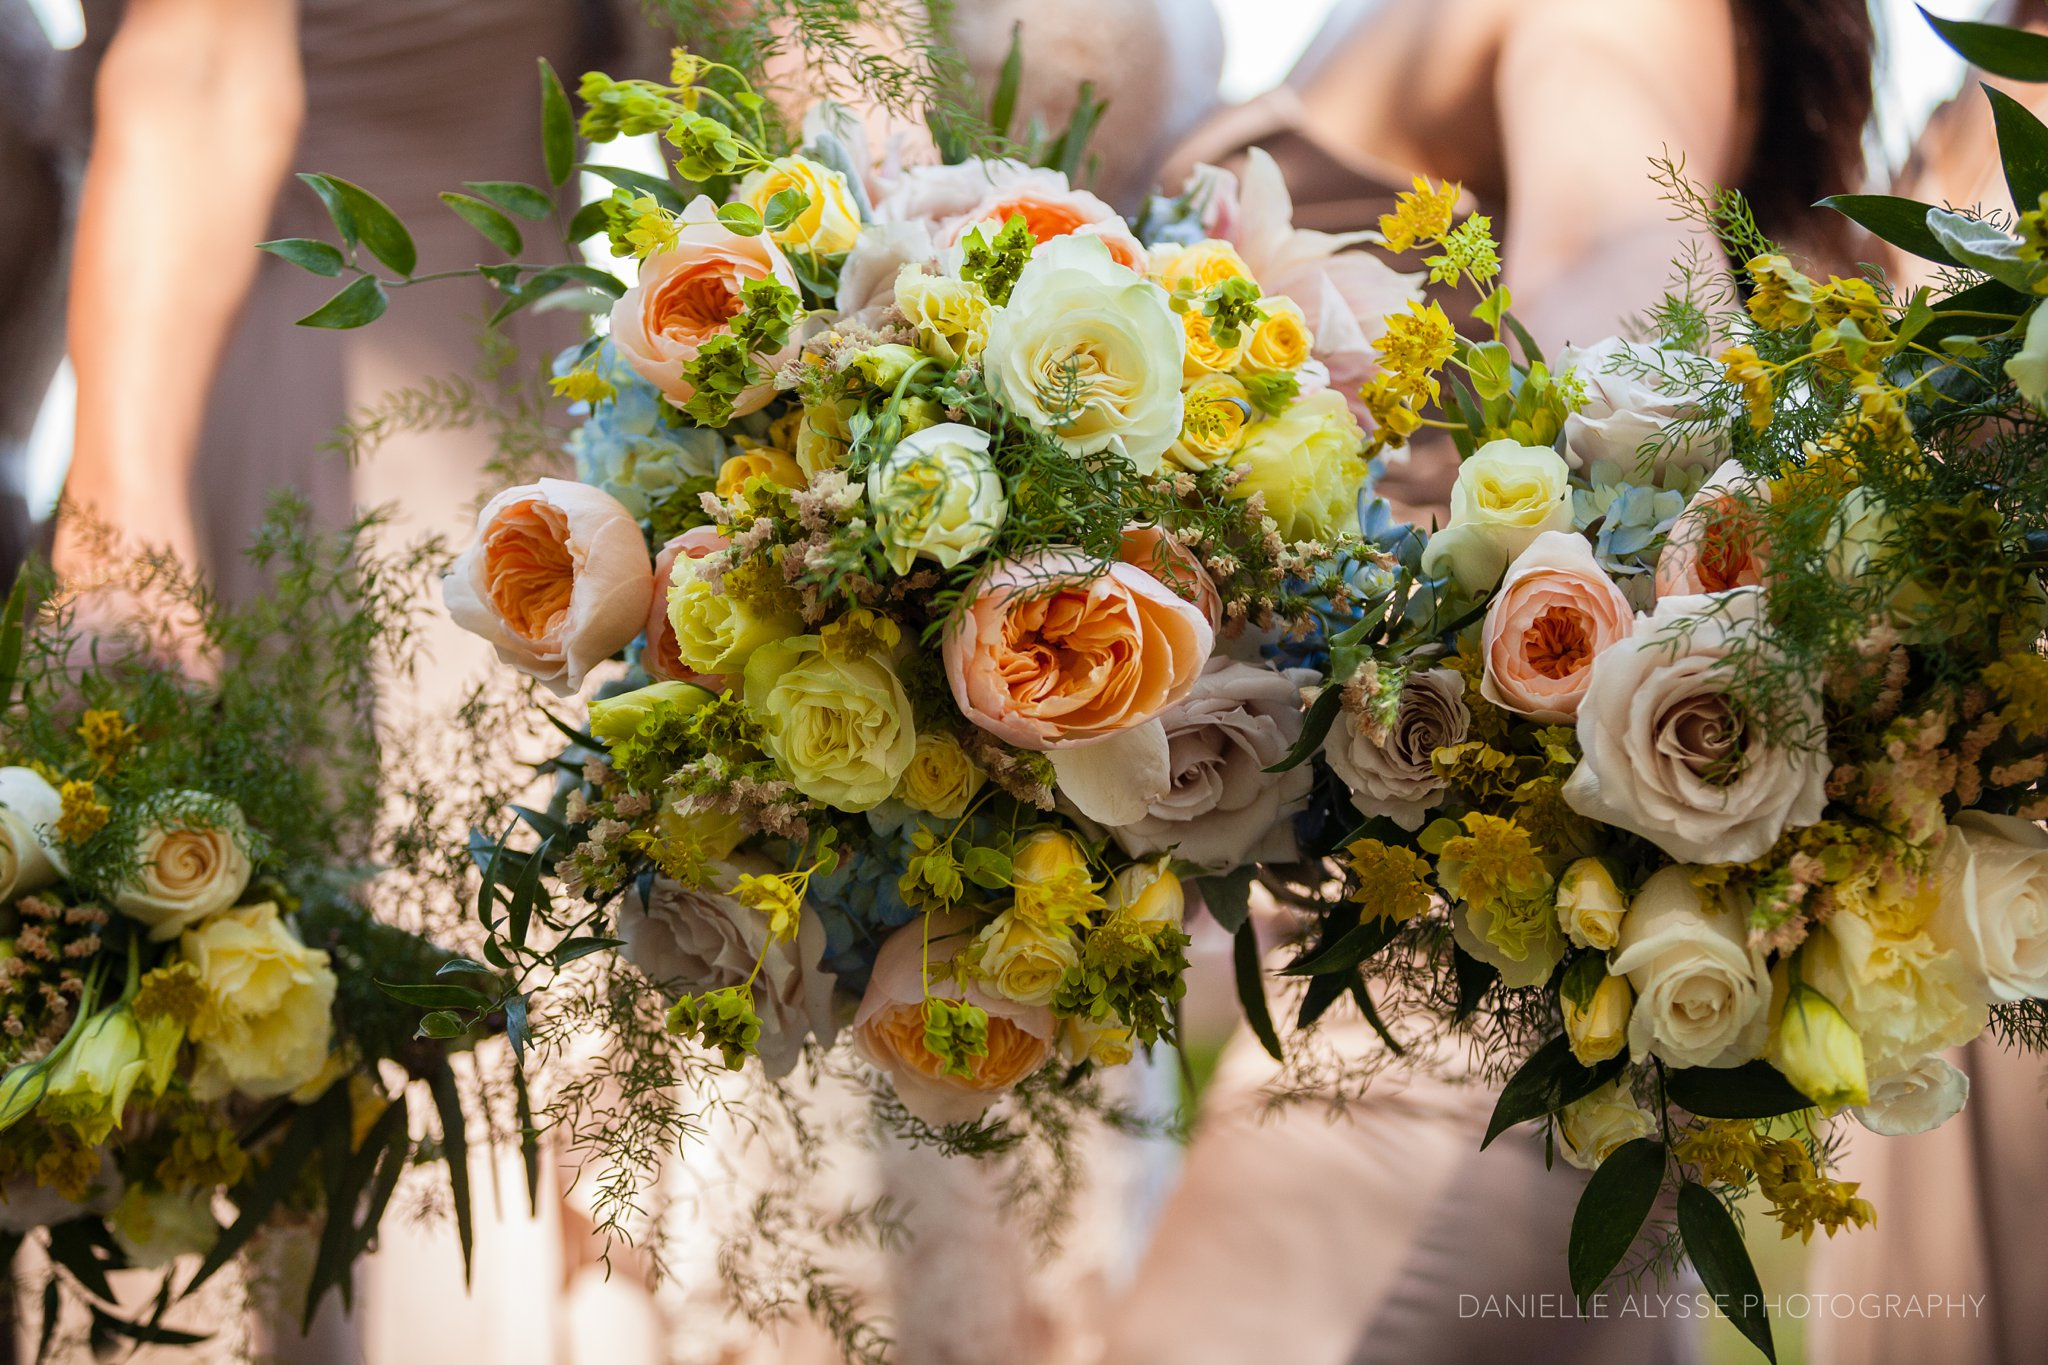 170429_blog_kimberly_ben_wedding_san_mateo_curiodyssey_danielle_alysse_photography_sacramento_photographer0303_WEB.jpg